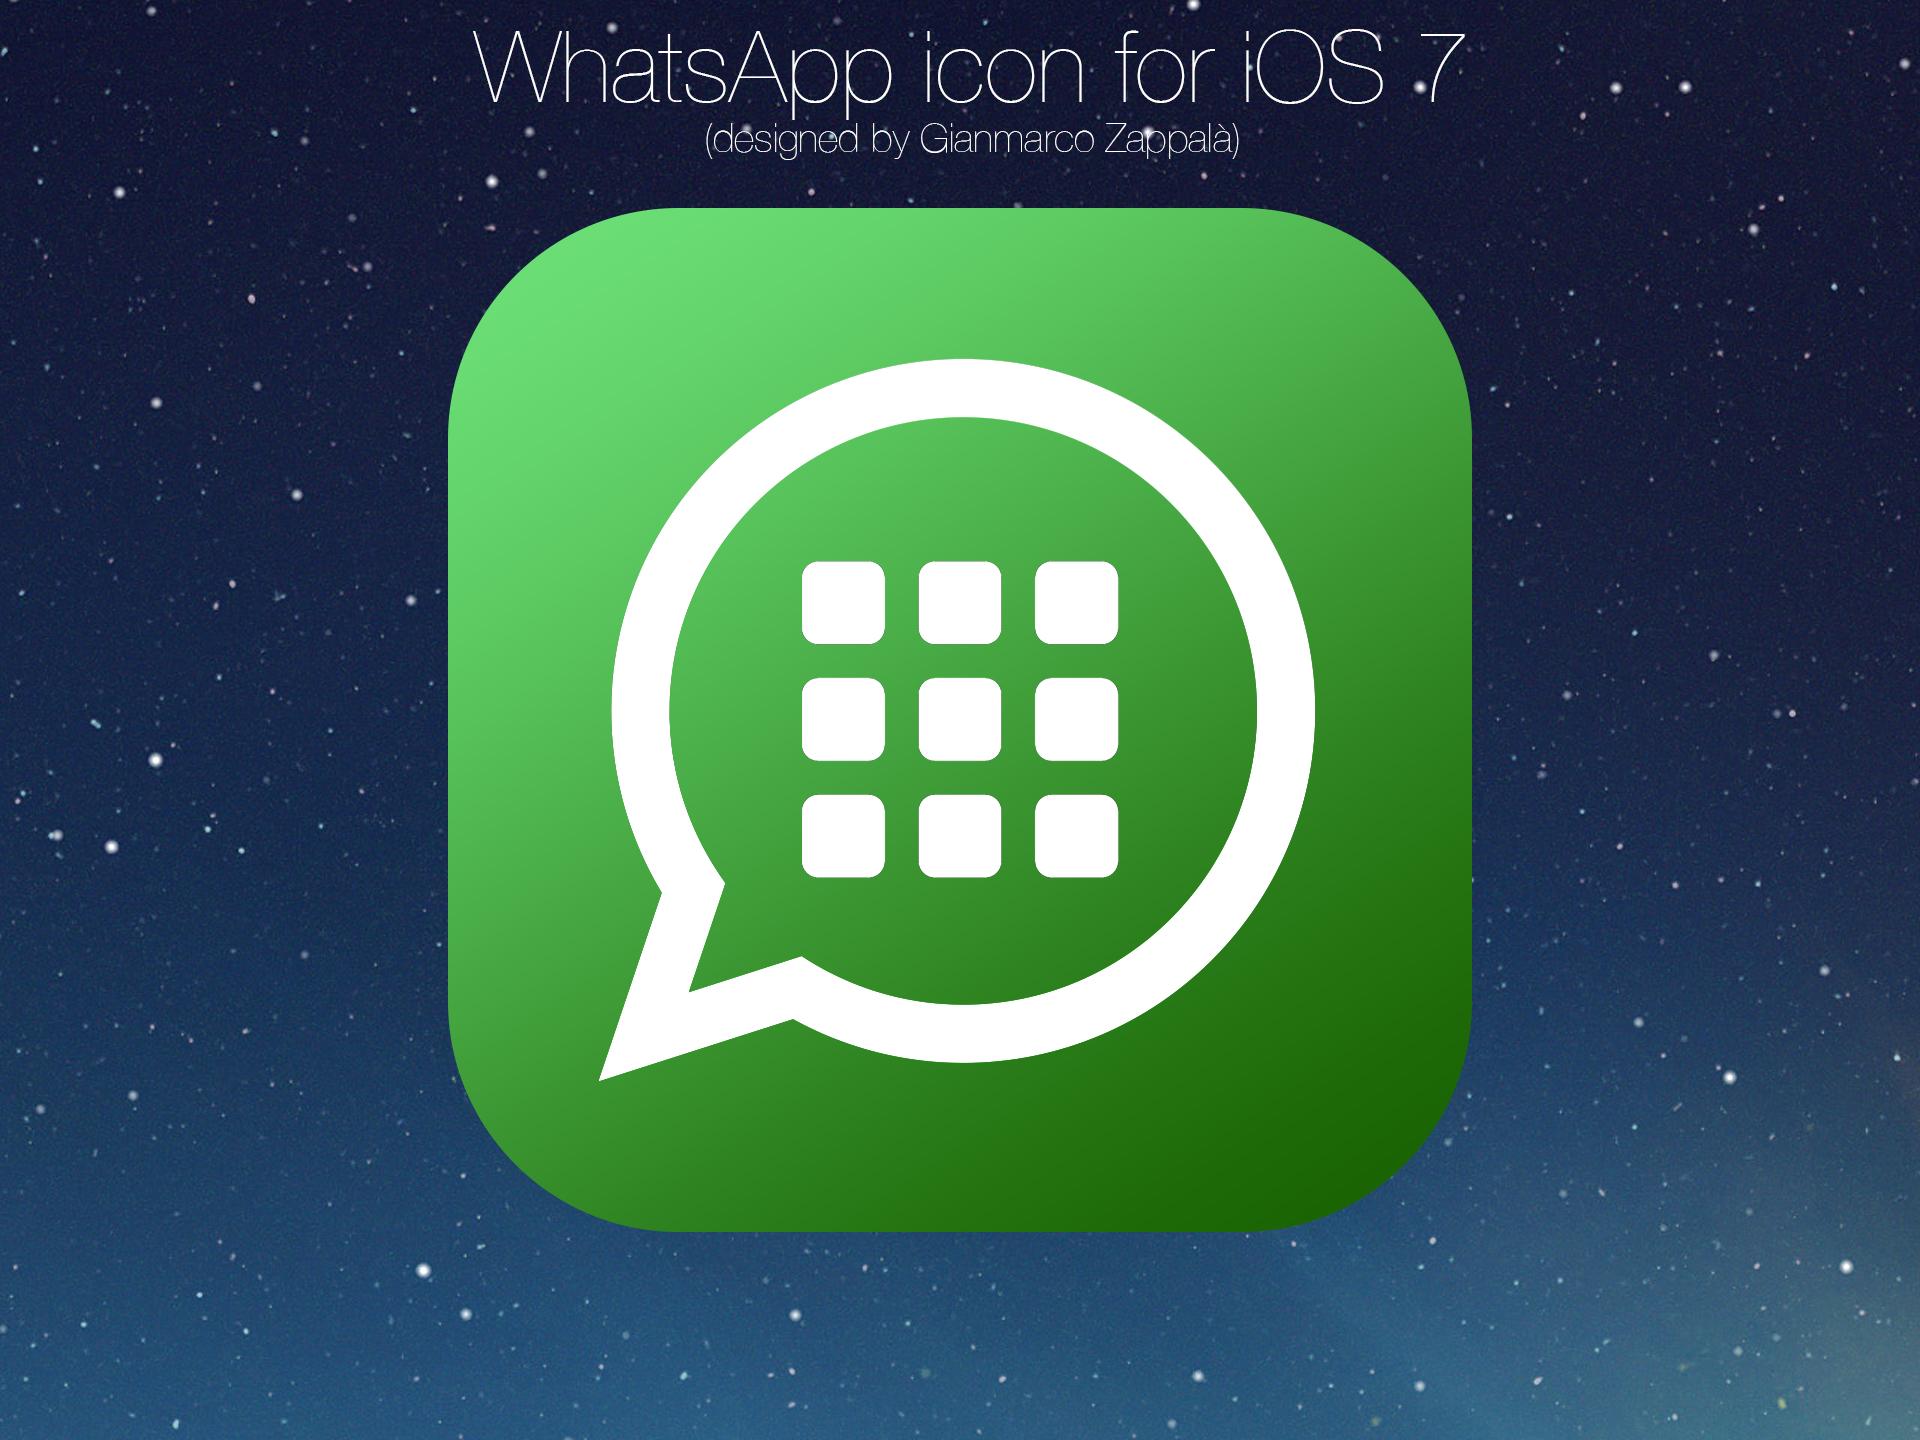 Icono whatsapp iOS7